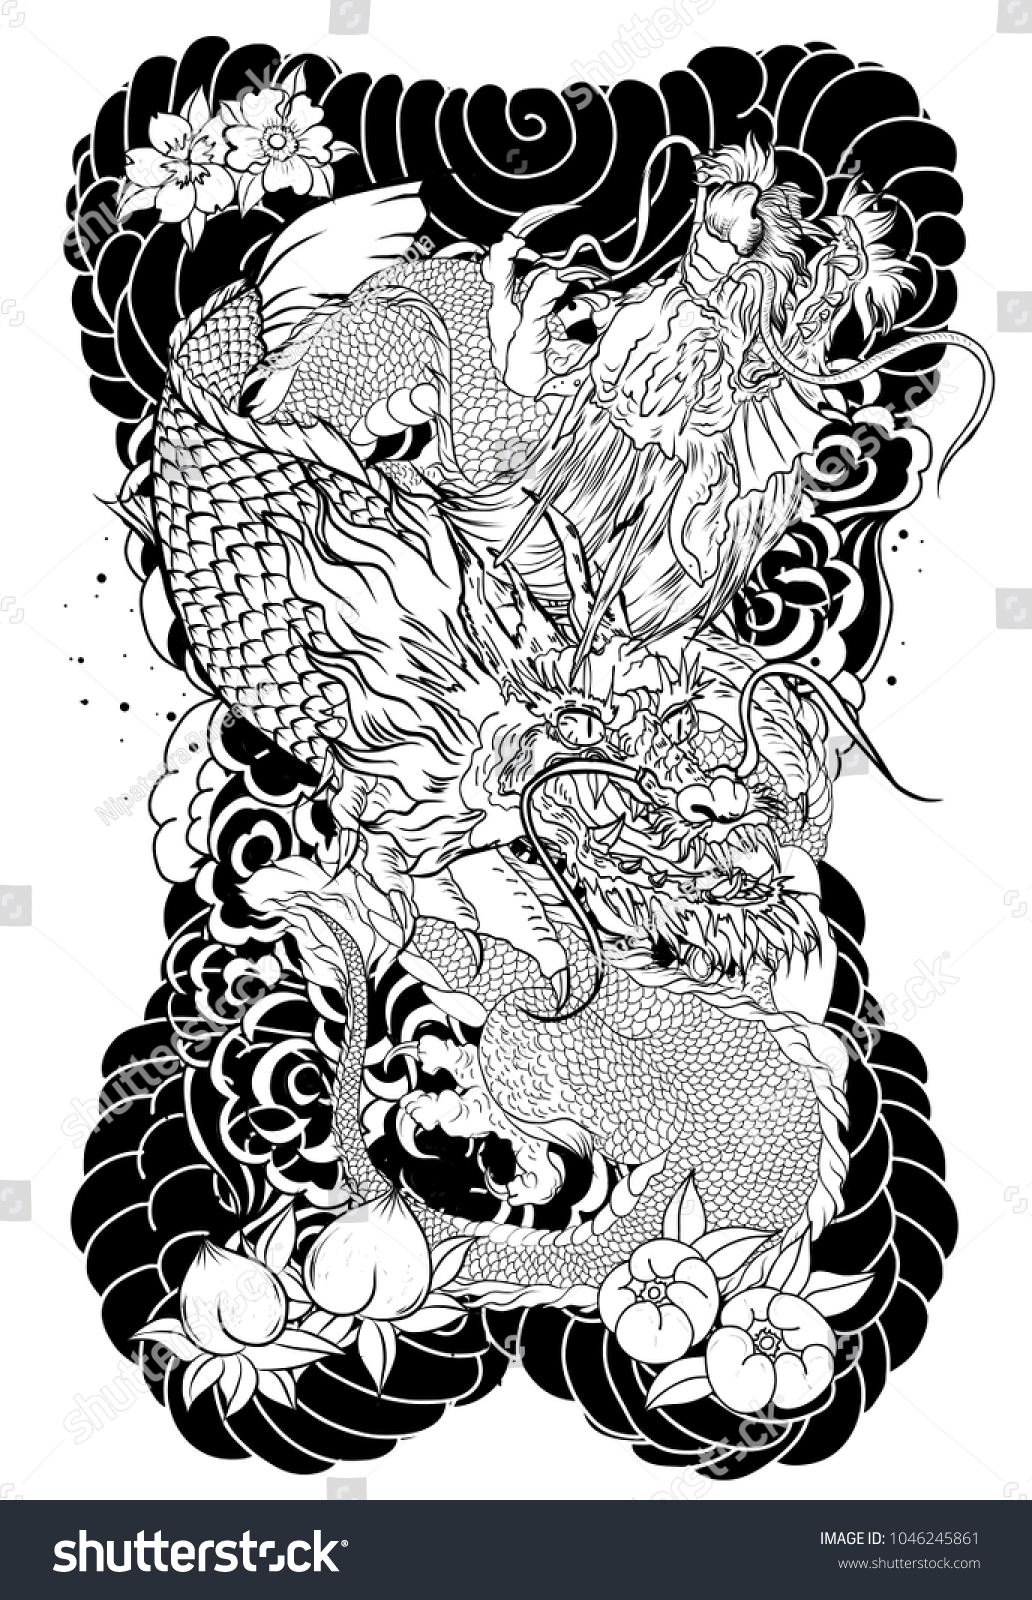 Silhouette dragon koi dragon fish lotus stock vector royalty free silhouette dragon with koi dragon fish and lotus flower tattooach with sakura and plum izmirmasajfo